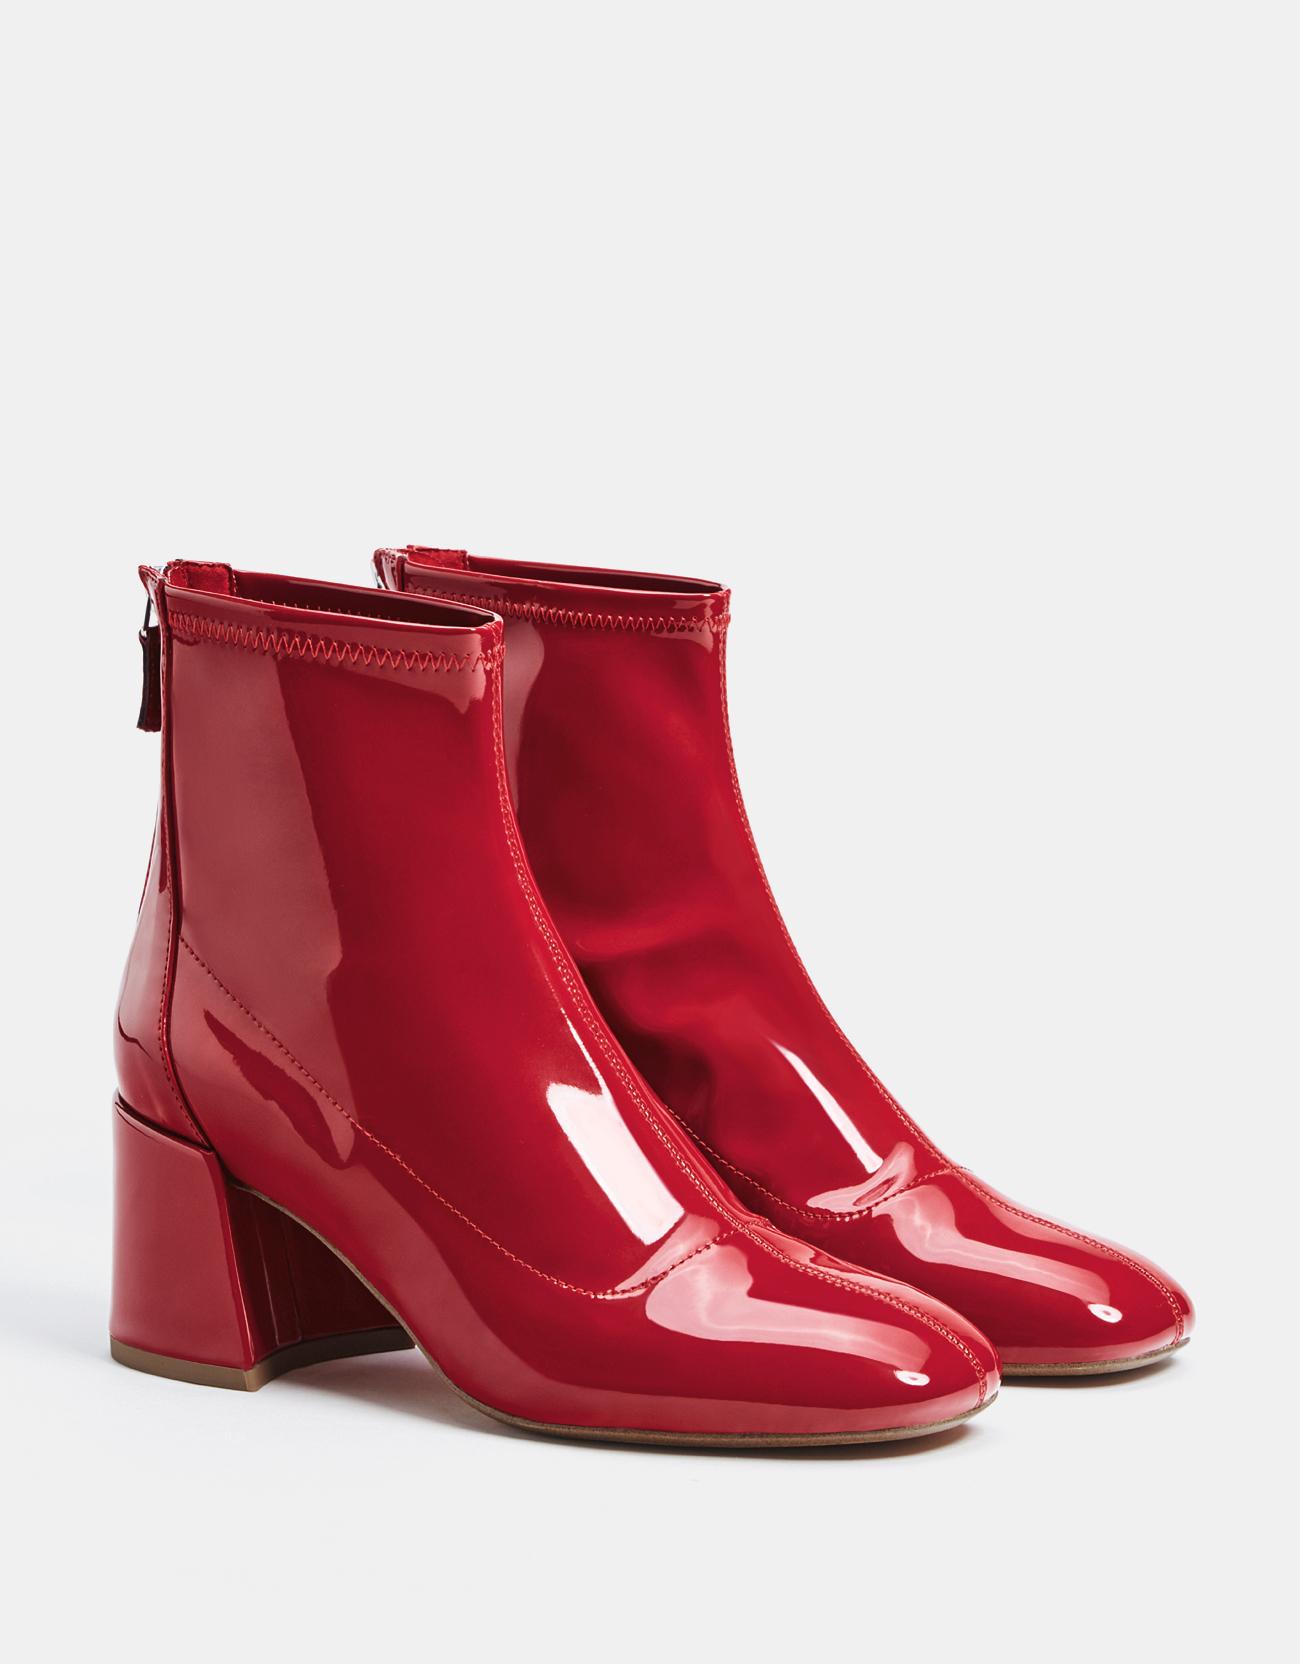 4a3ea3aebda9 Bottes rouges en vinyle Bershka - Bottez en rouge ! - Elle